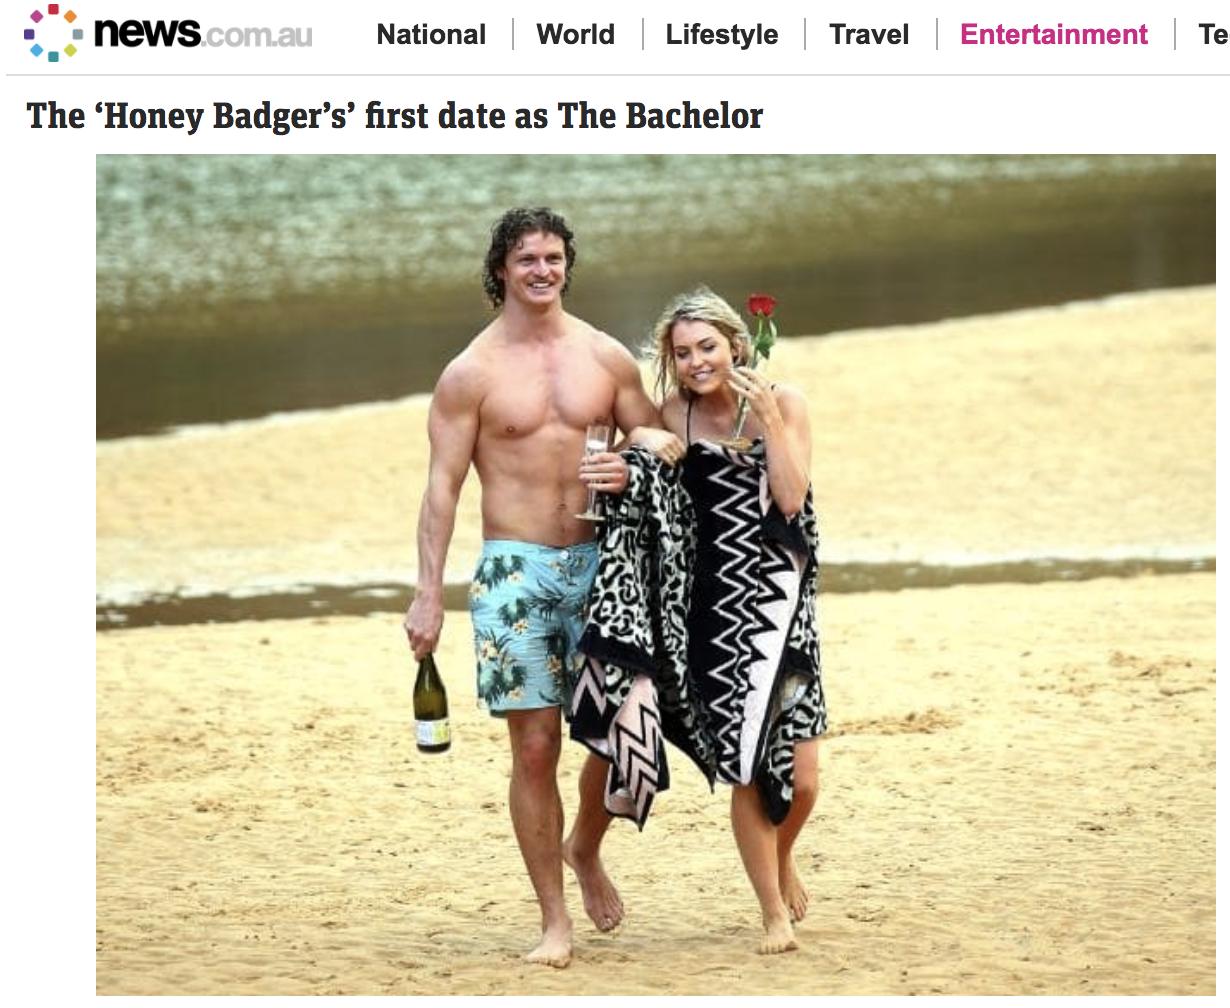 The Bachelor paparrazi photo (news.com.au) [4]